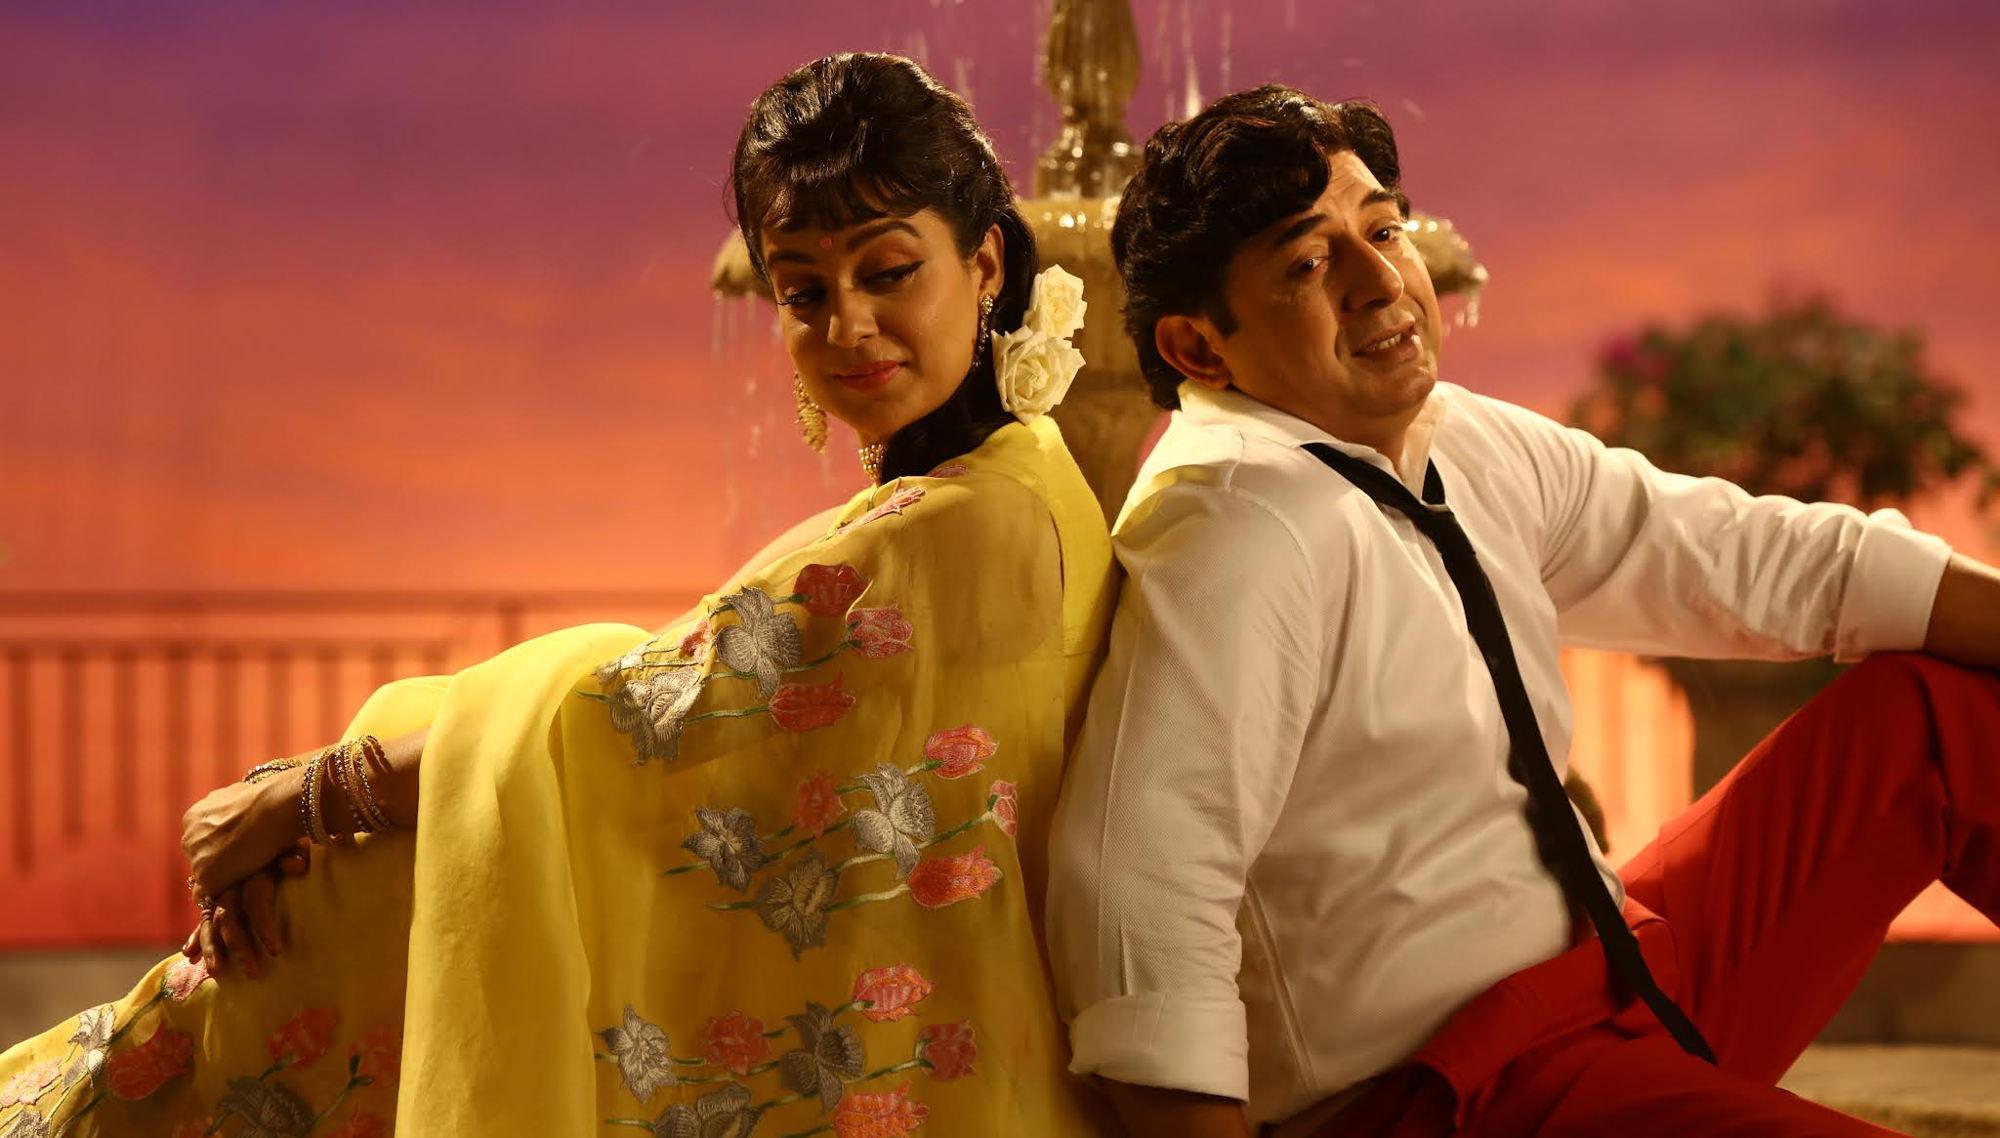 Kangana Ranaut, Aravind Swamy in Thalaivi Movie Release On September 10